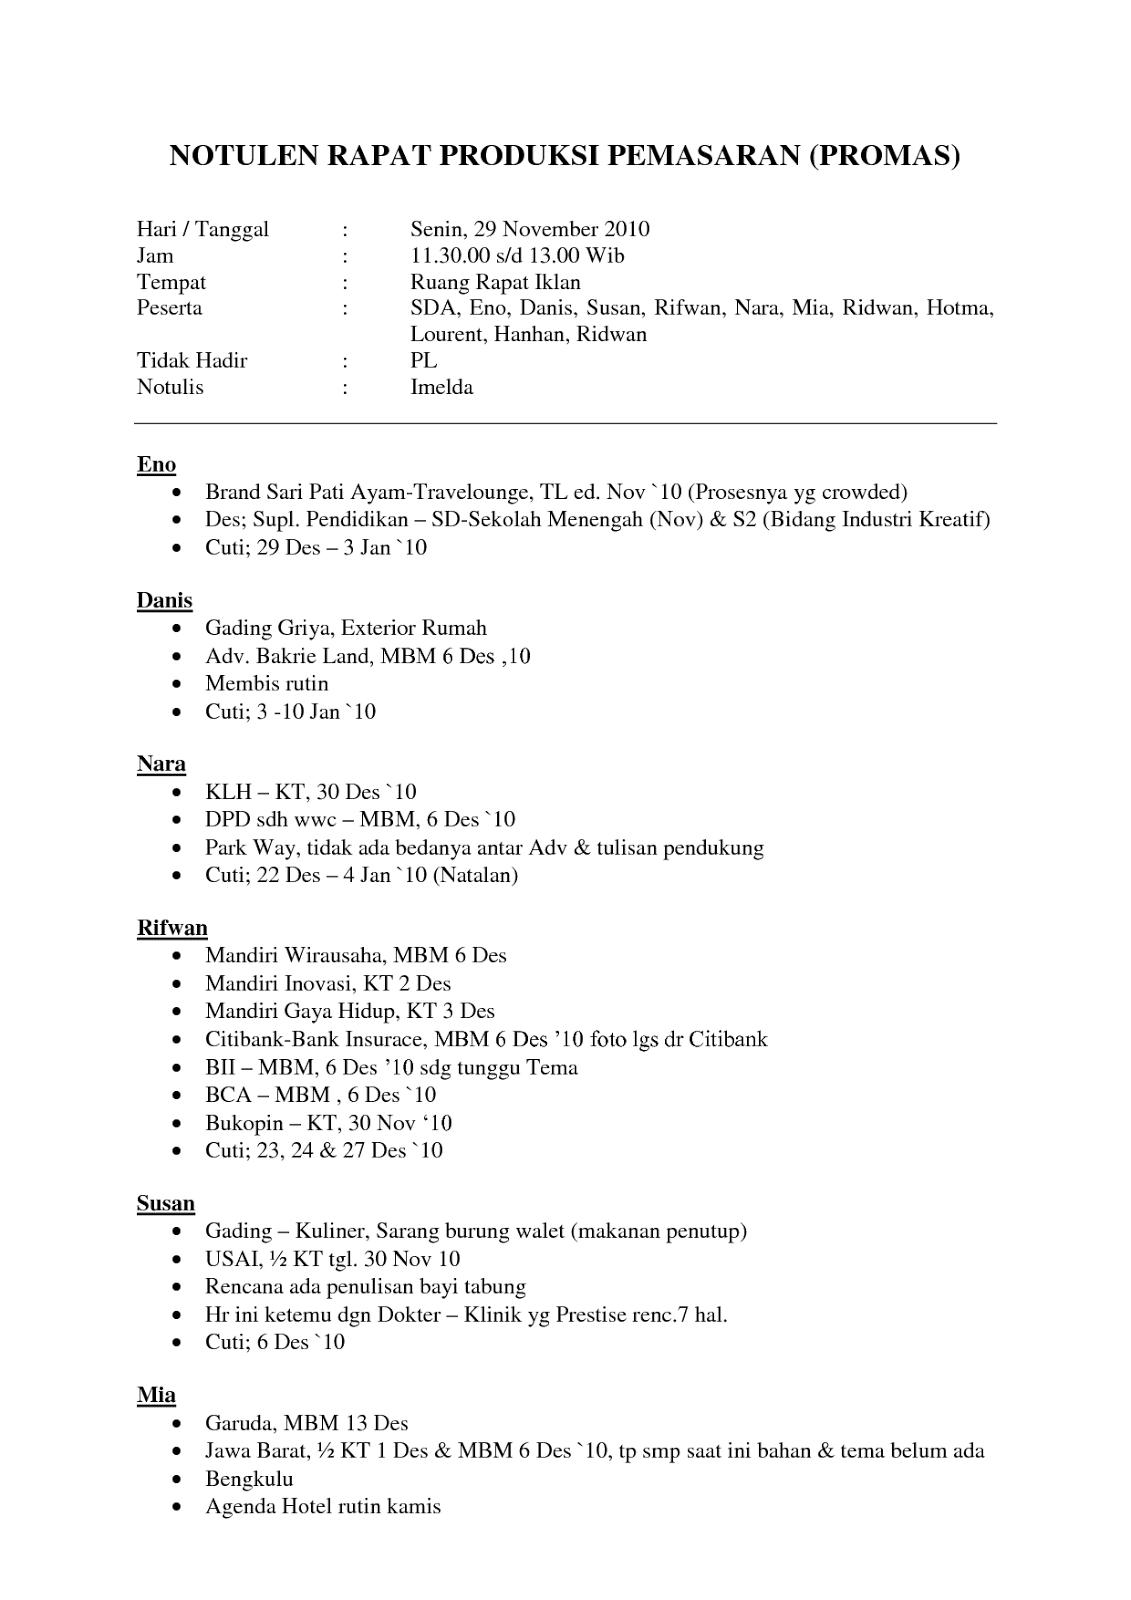 Contoh Notulen Rapat Perusahaan Swasta